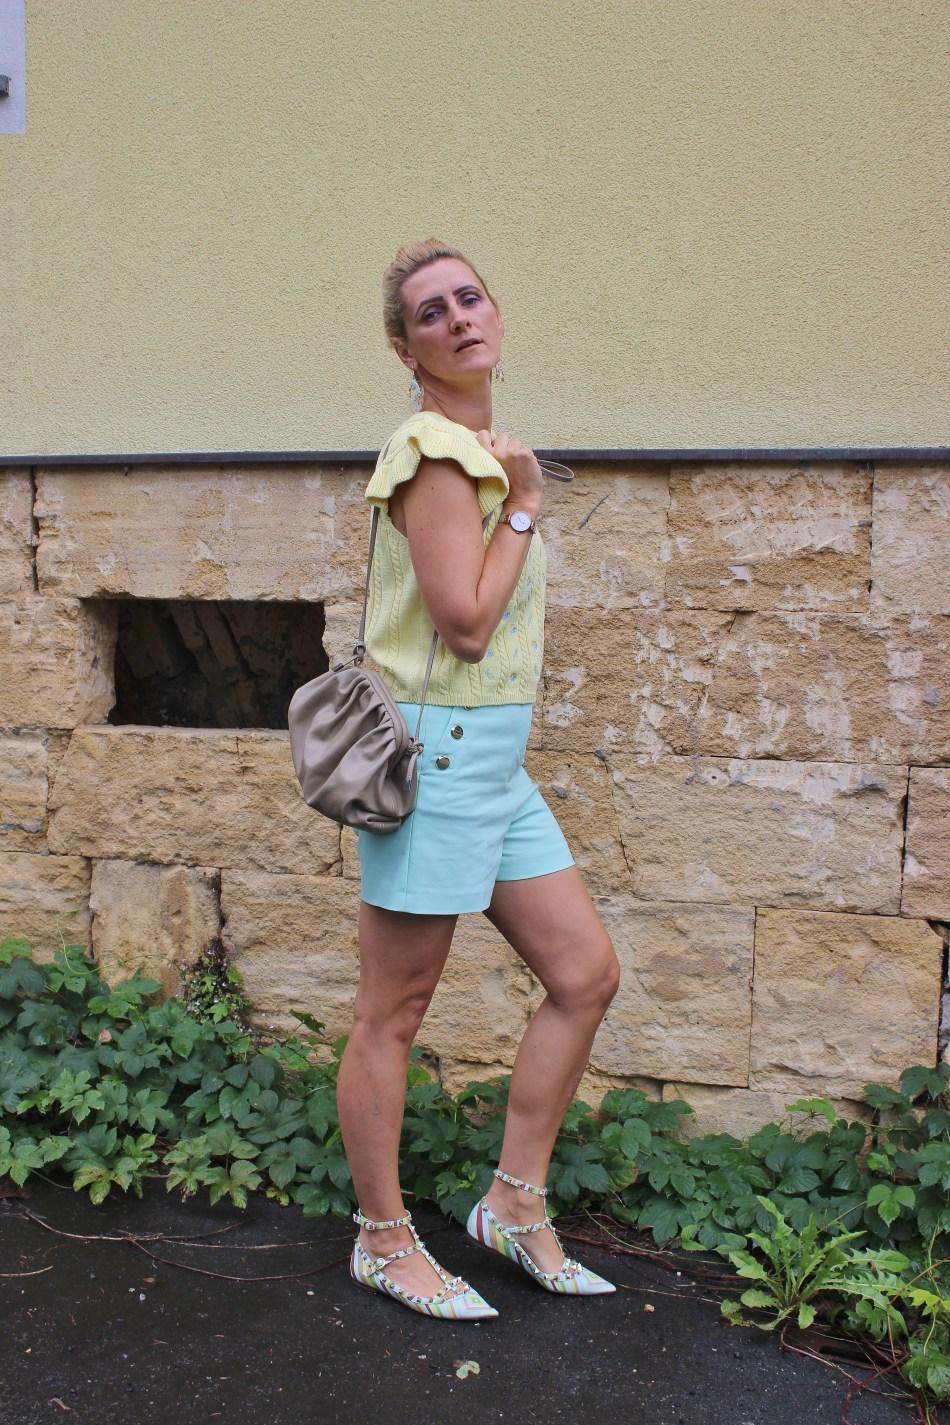 Häkel-Strick-Trends 2020-Handarbeit-Trendblogger-Shorts Mint Zara- Valentino Rockstud Sandalen-Bottega Veneta Tasche-Look Alike-carrieslifestyle-Tamara Prutsch